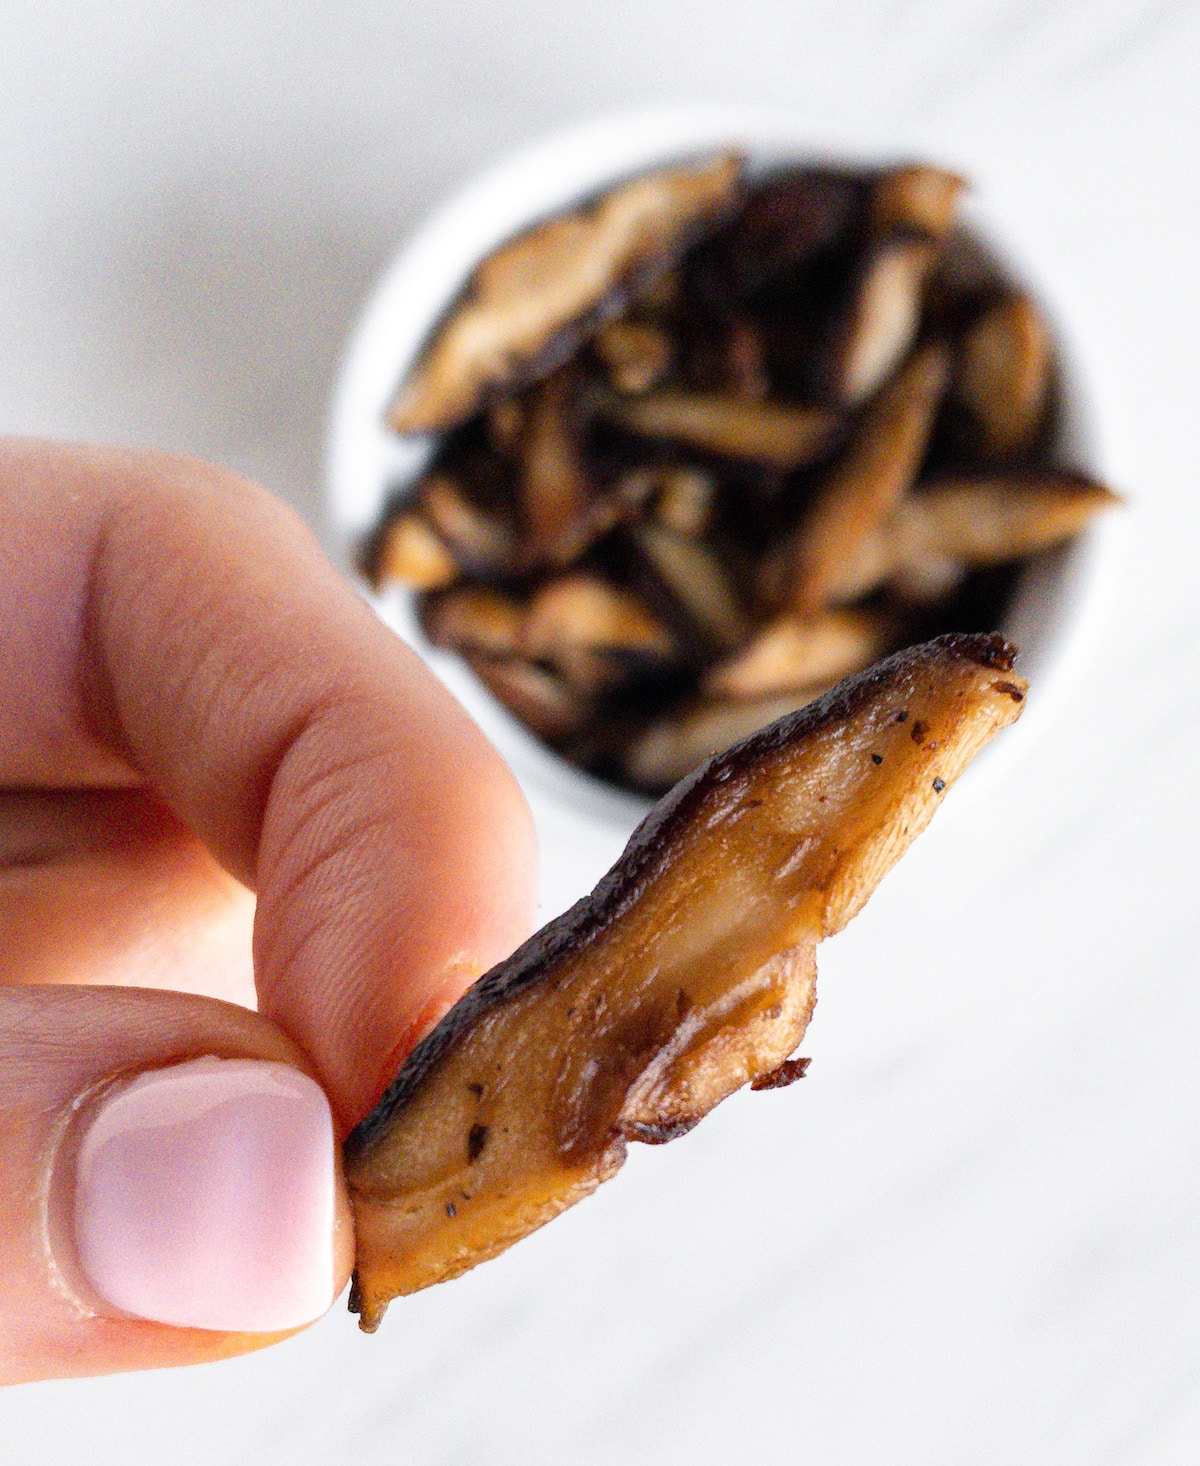 Holding a piece of vegan mushroom bacon